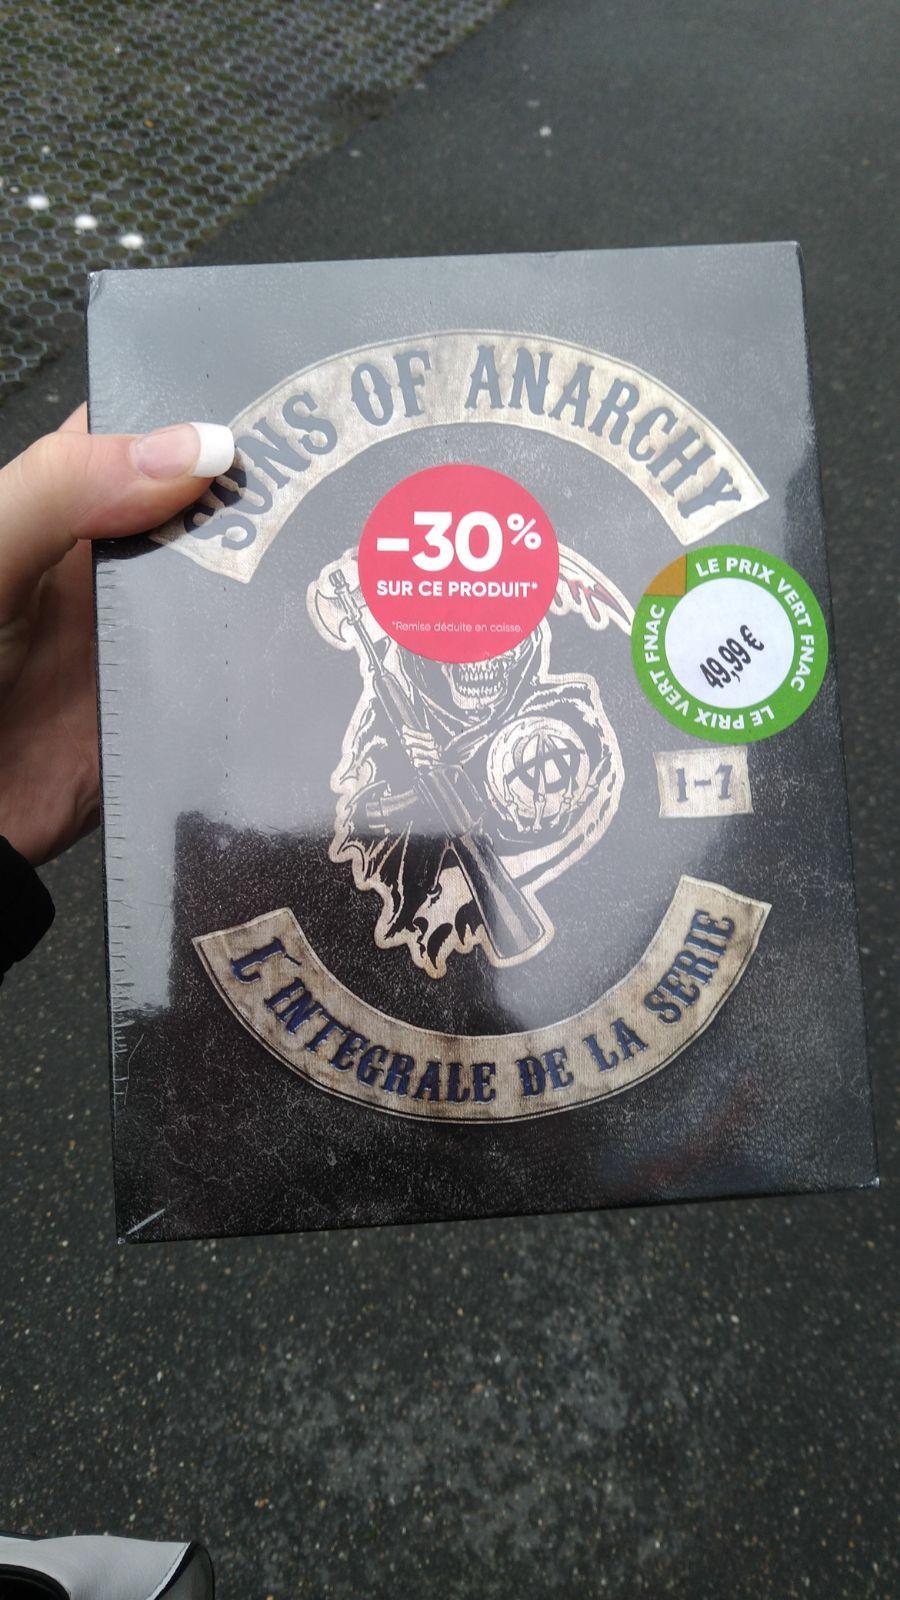 Coffret DVD Intégral Sons Of Anarchy - Geneviève des bois (91)